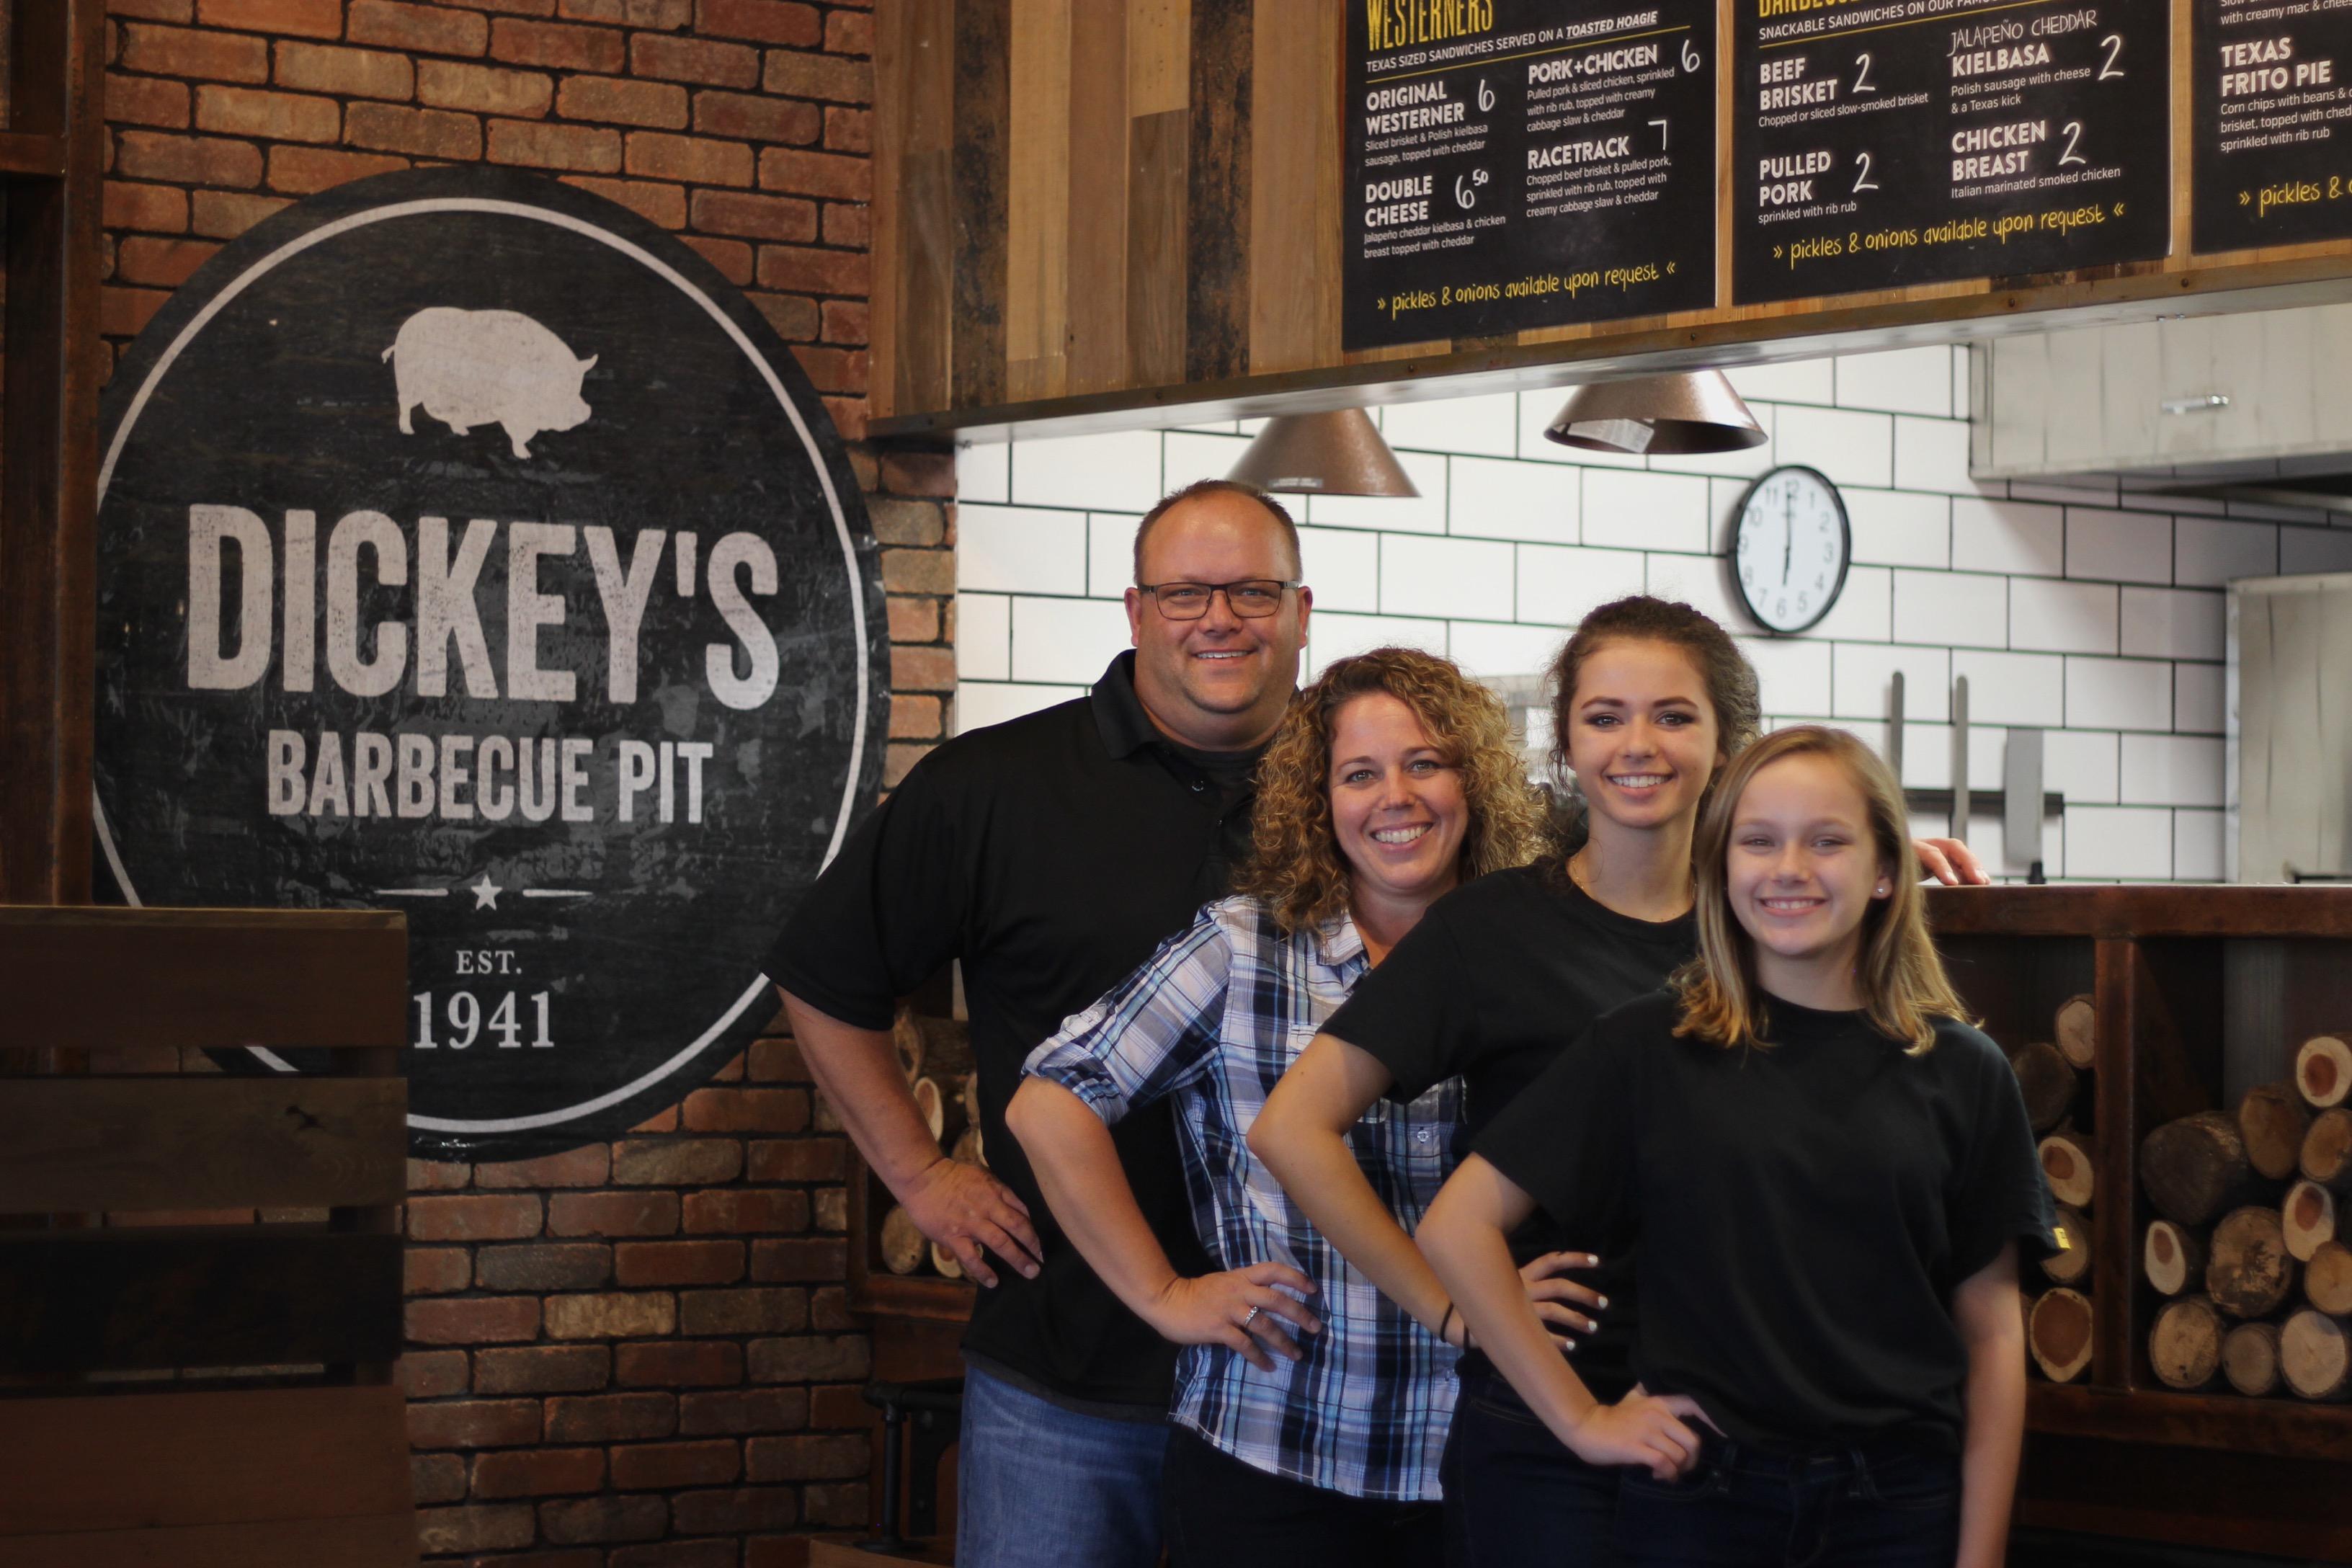 Bradenton Herald: Dickey's Barbecue Pit opens Thursday in Bradenton